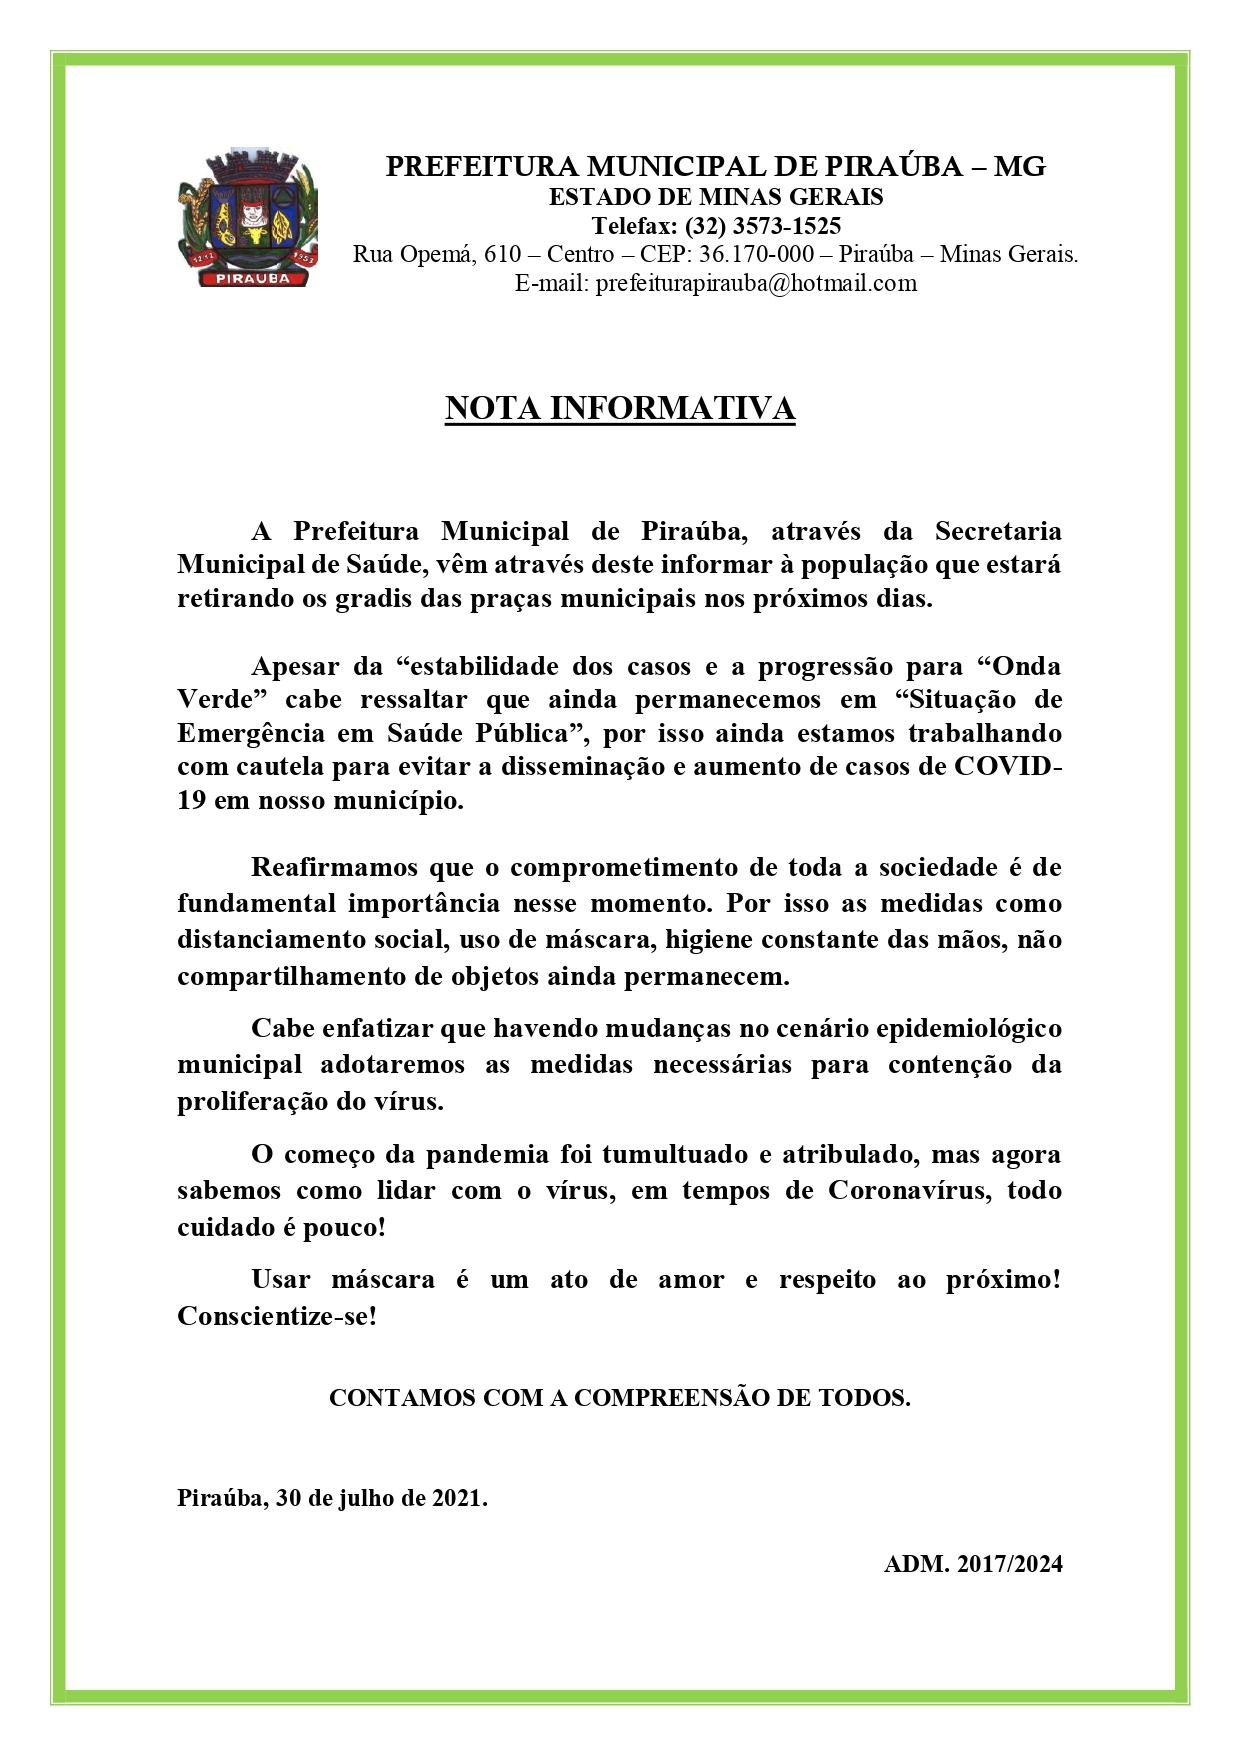 NOTA INFORMATIVA - PREFEITURA MUNICIPAL DE PIRAÚBA - 30/07/2021